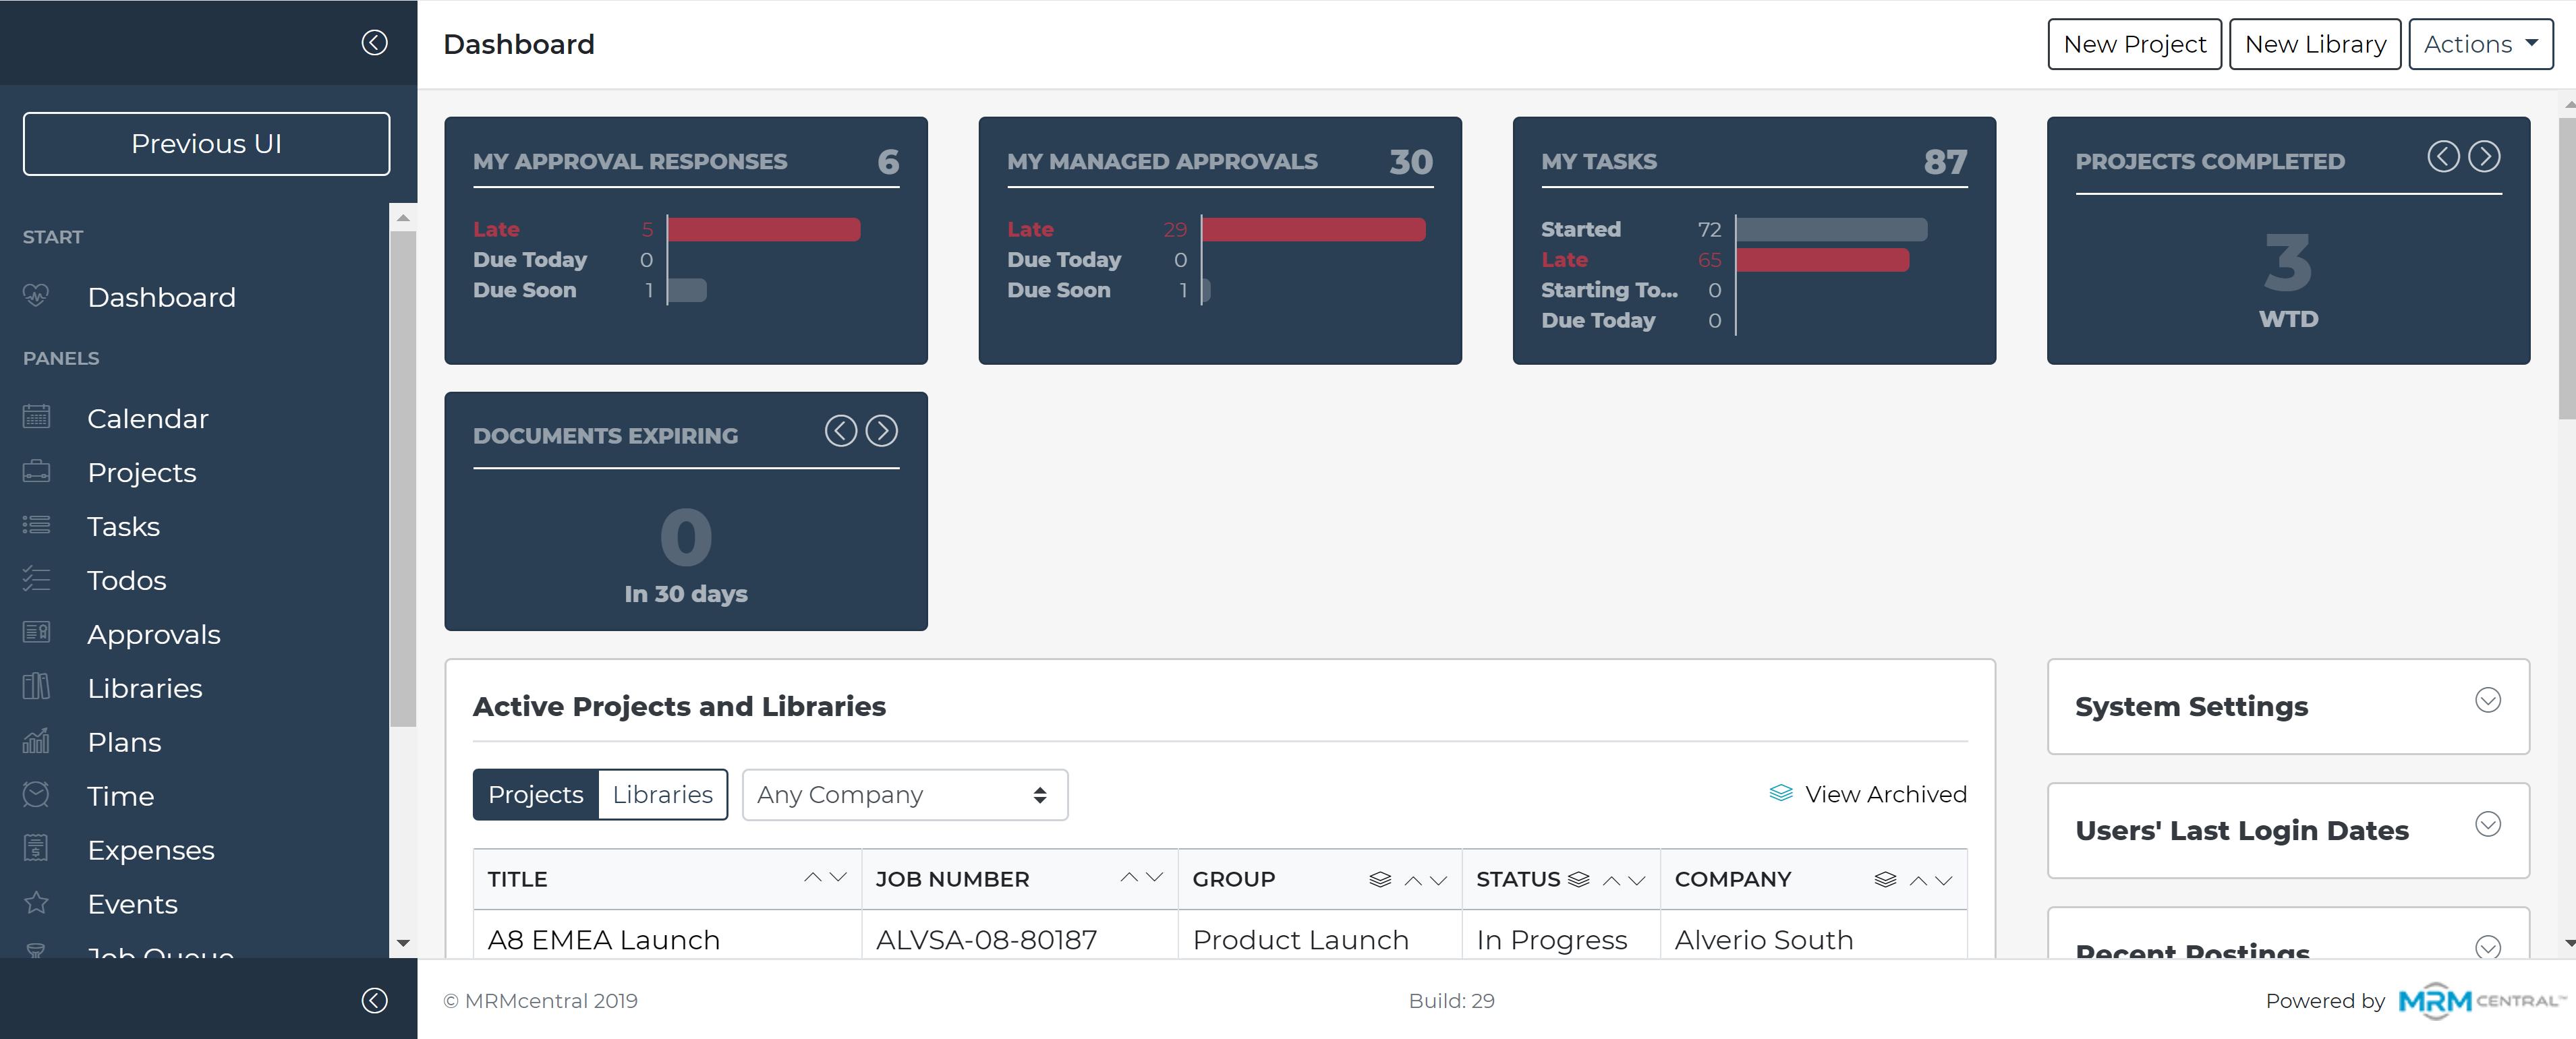 MRMcentral dashboard screenshot